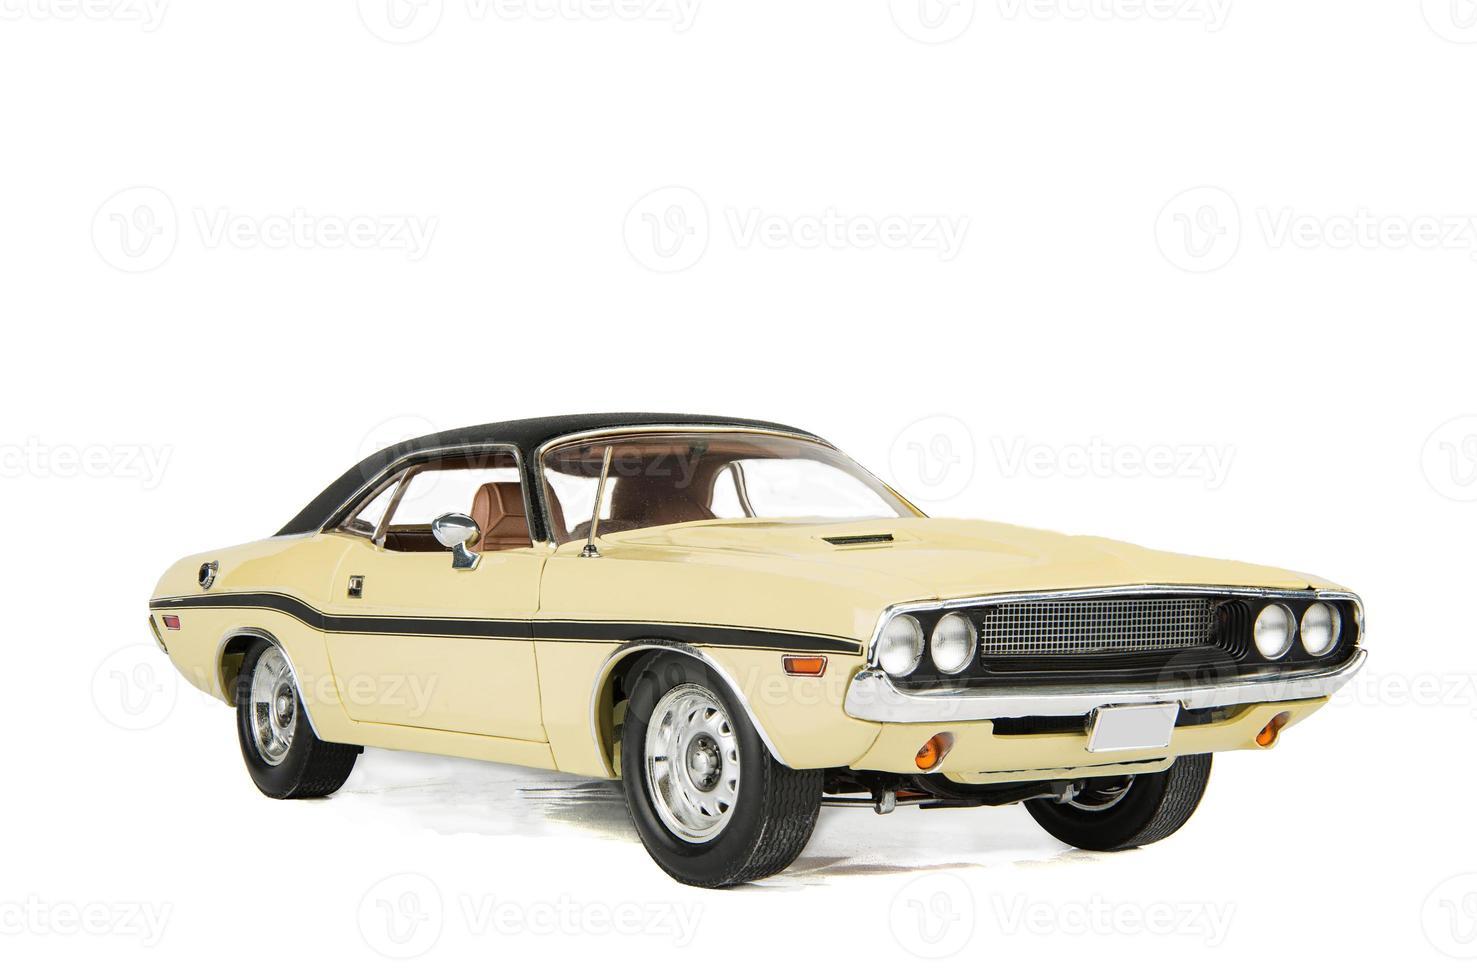 voiture ancienne 1970 photo